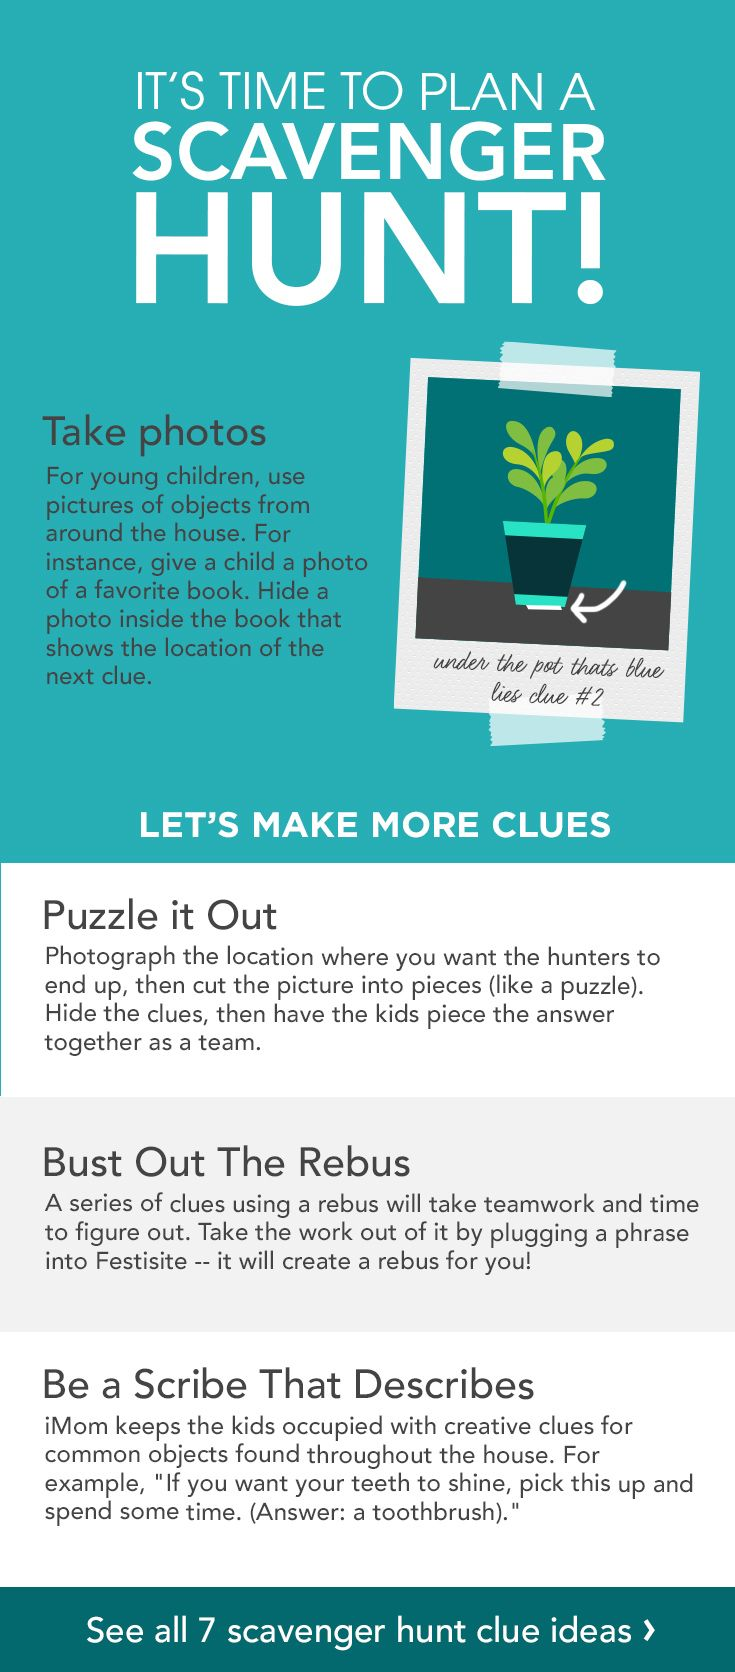 Treasure hunt clues for adults